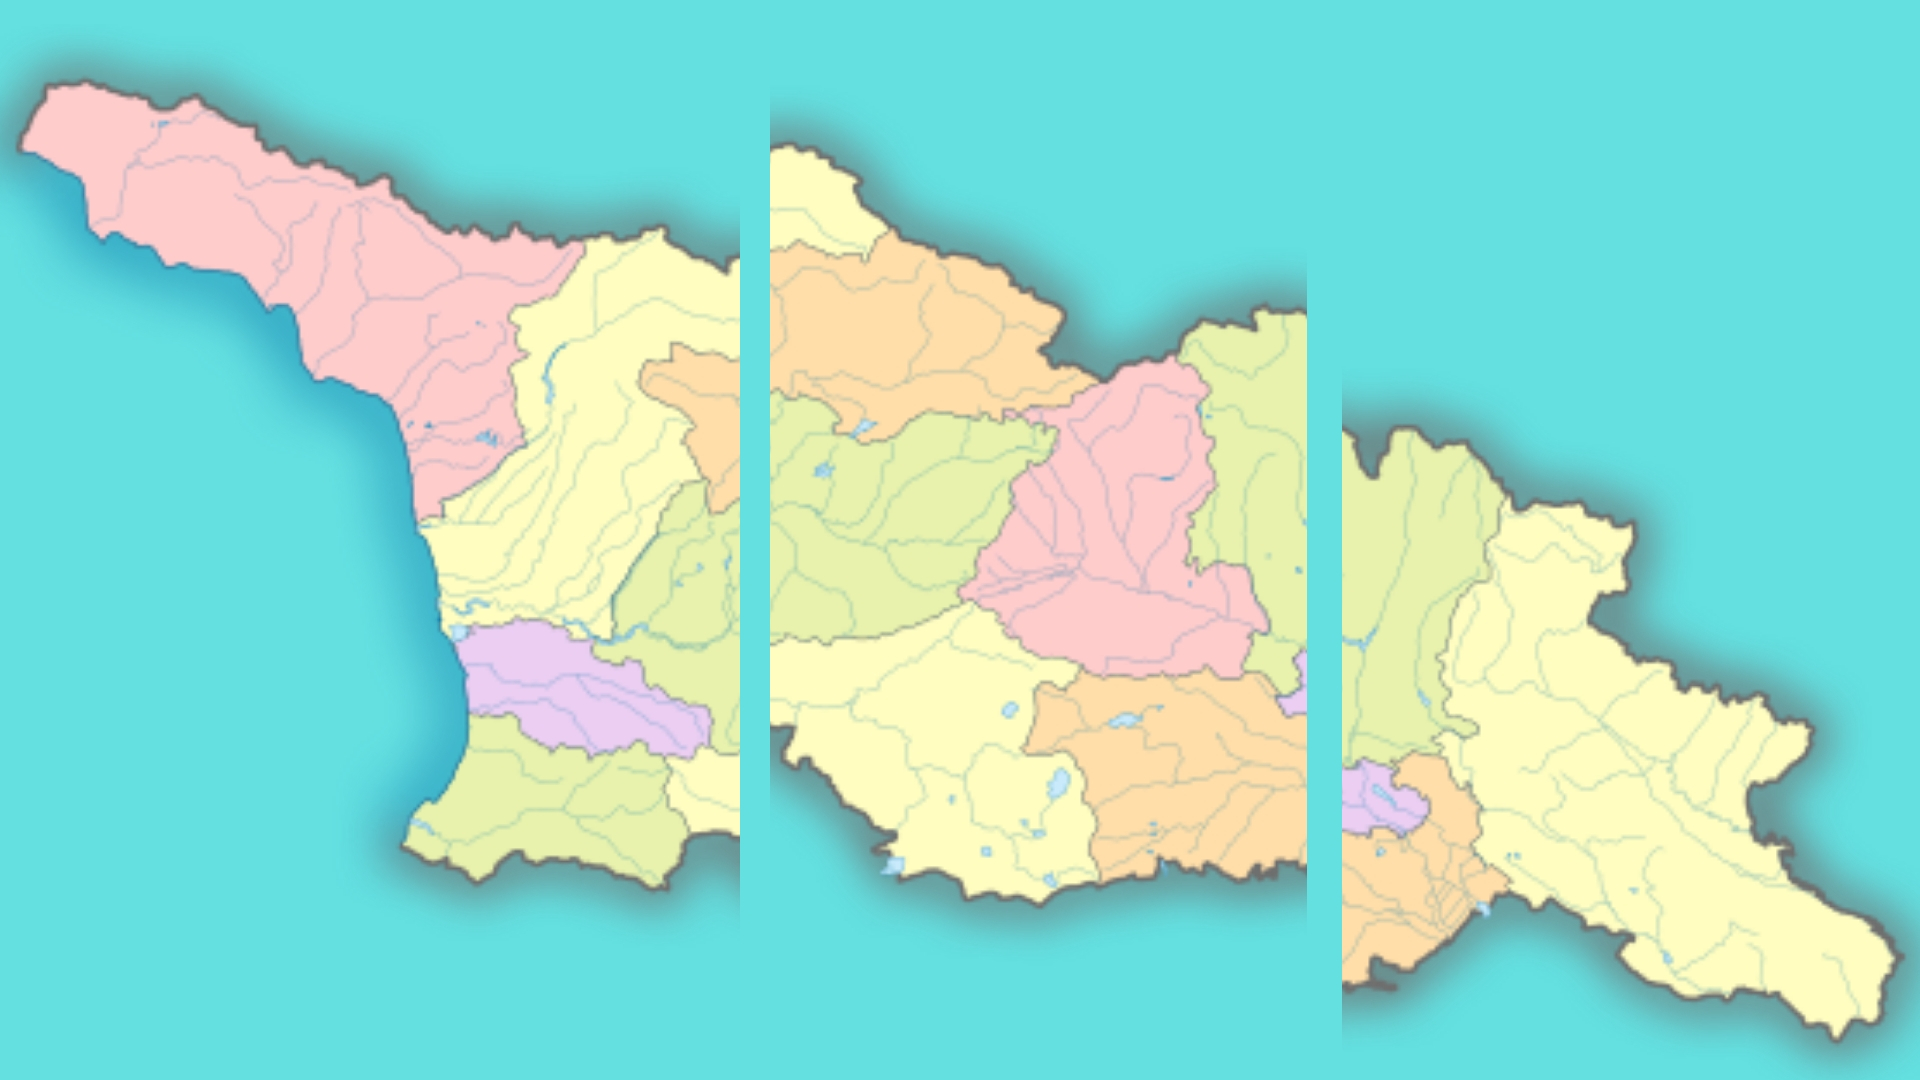 Georgia Map уголовный кодекс уголовный кодекс